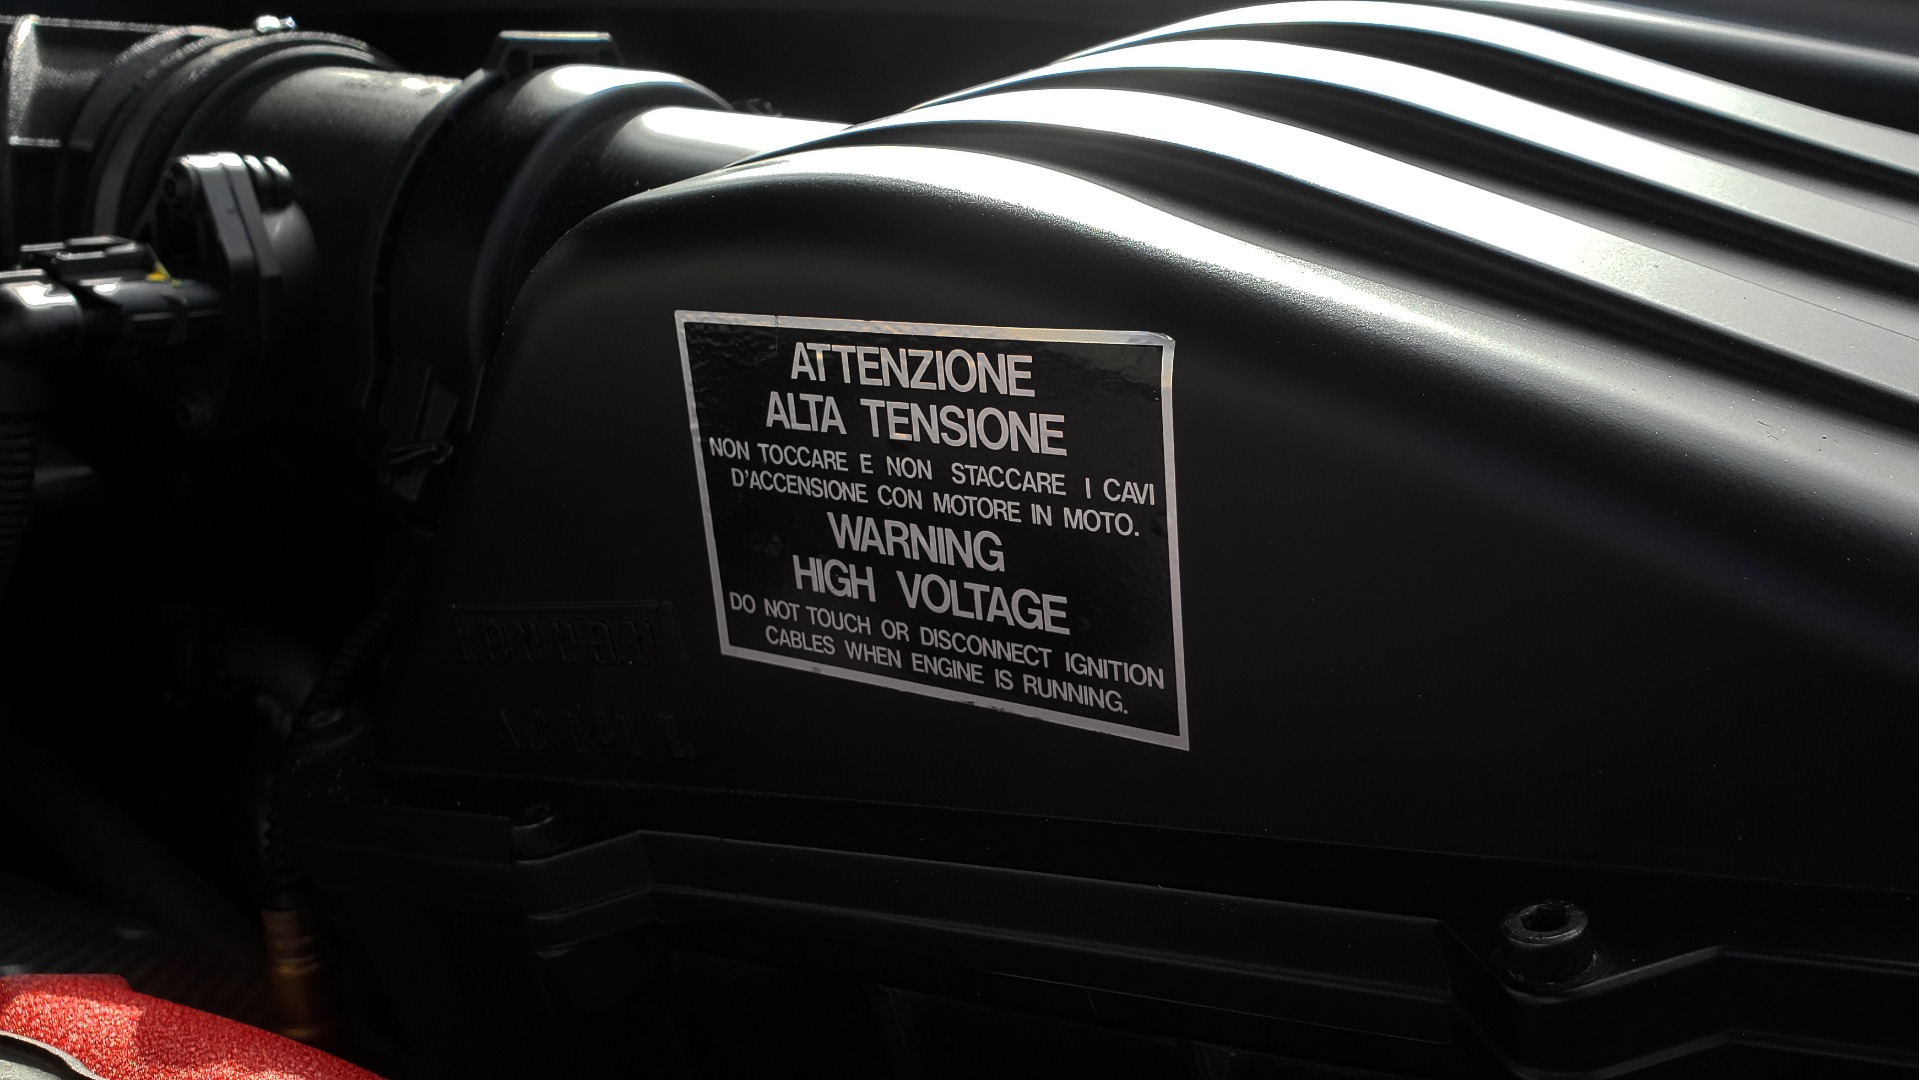 Used 2007 Ferrari 599 GTB FIORANO HGTE / V12 / F1 TRANS / NAV / BOSE / CUSTOM WHEELS for sale $109,999 at Formula Imports in Charlotte NC 28227 64